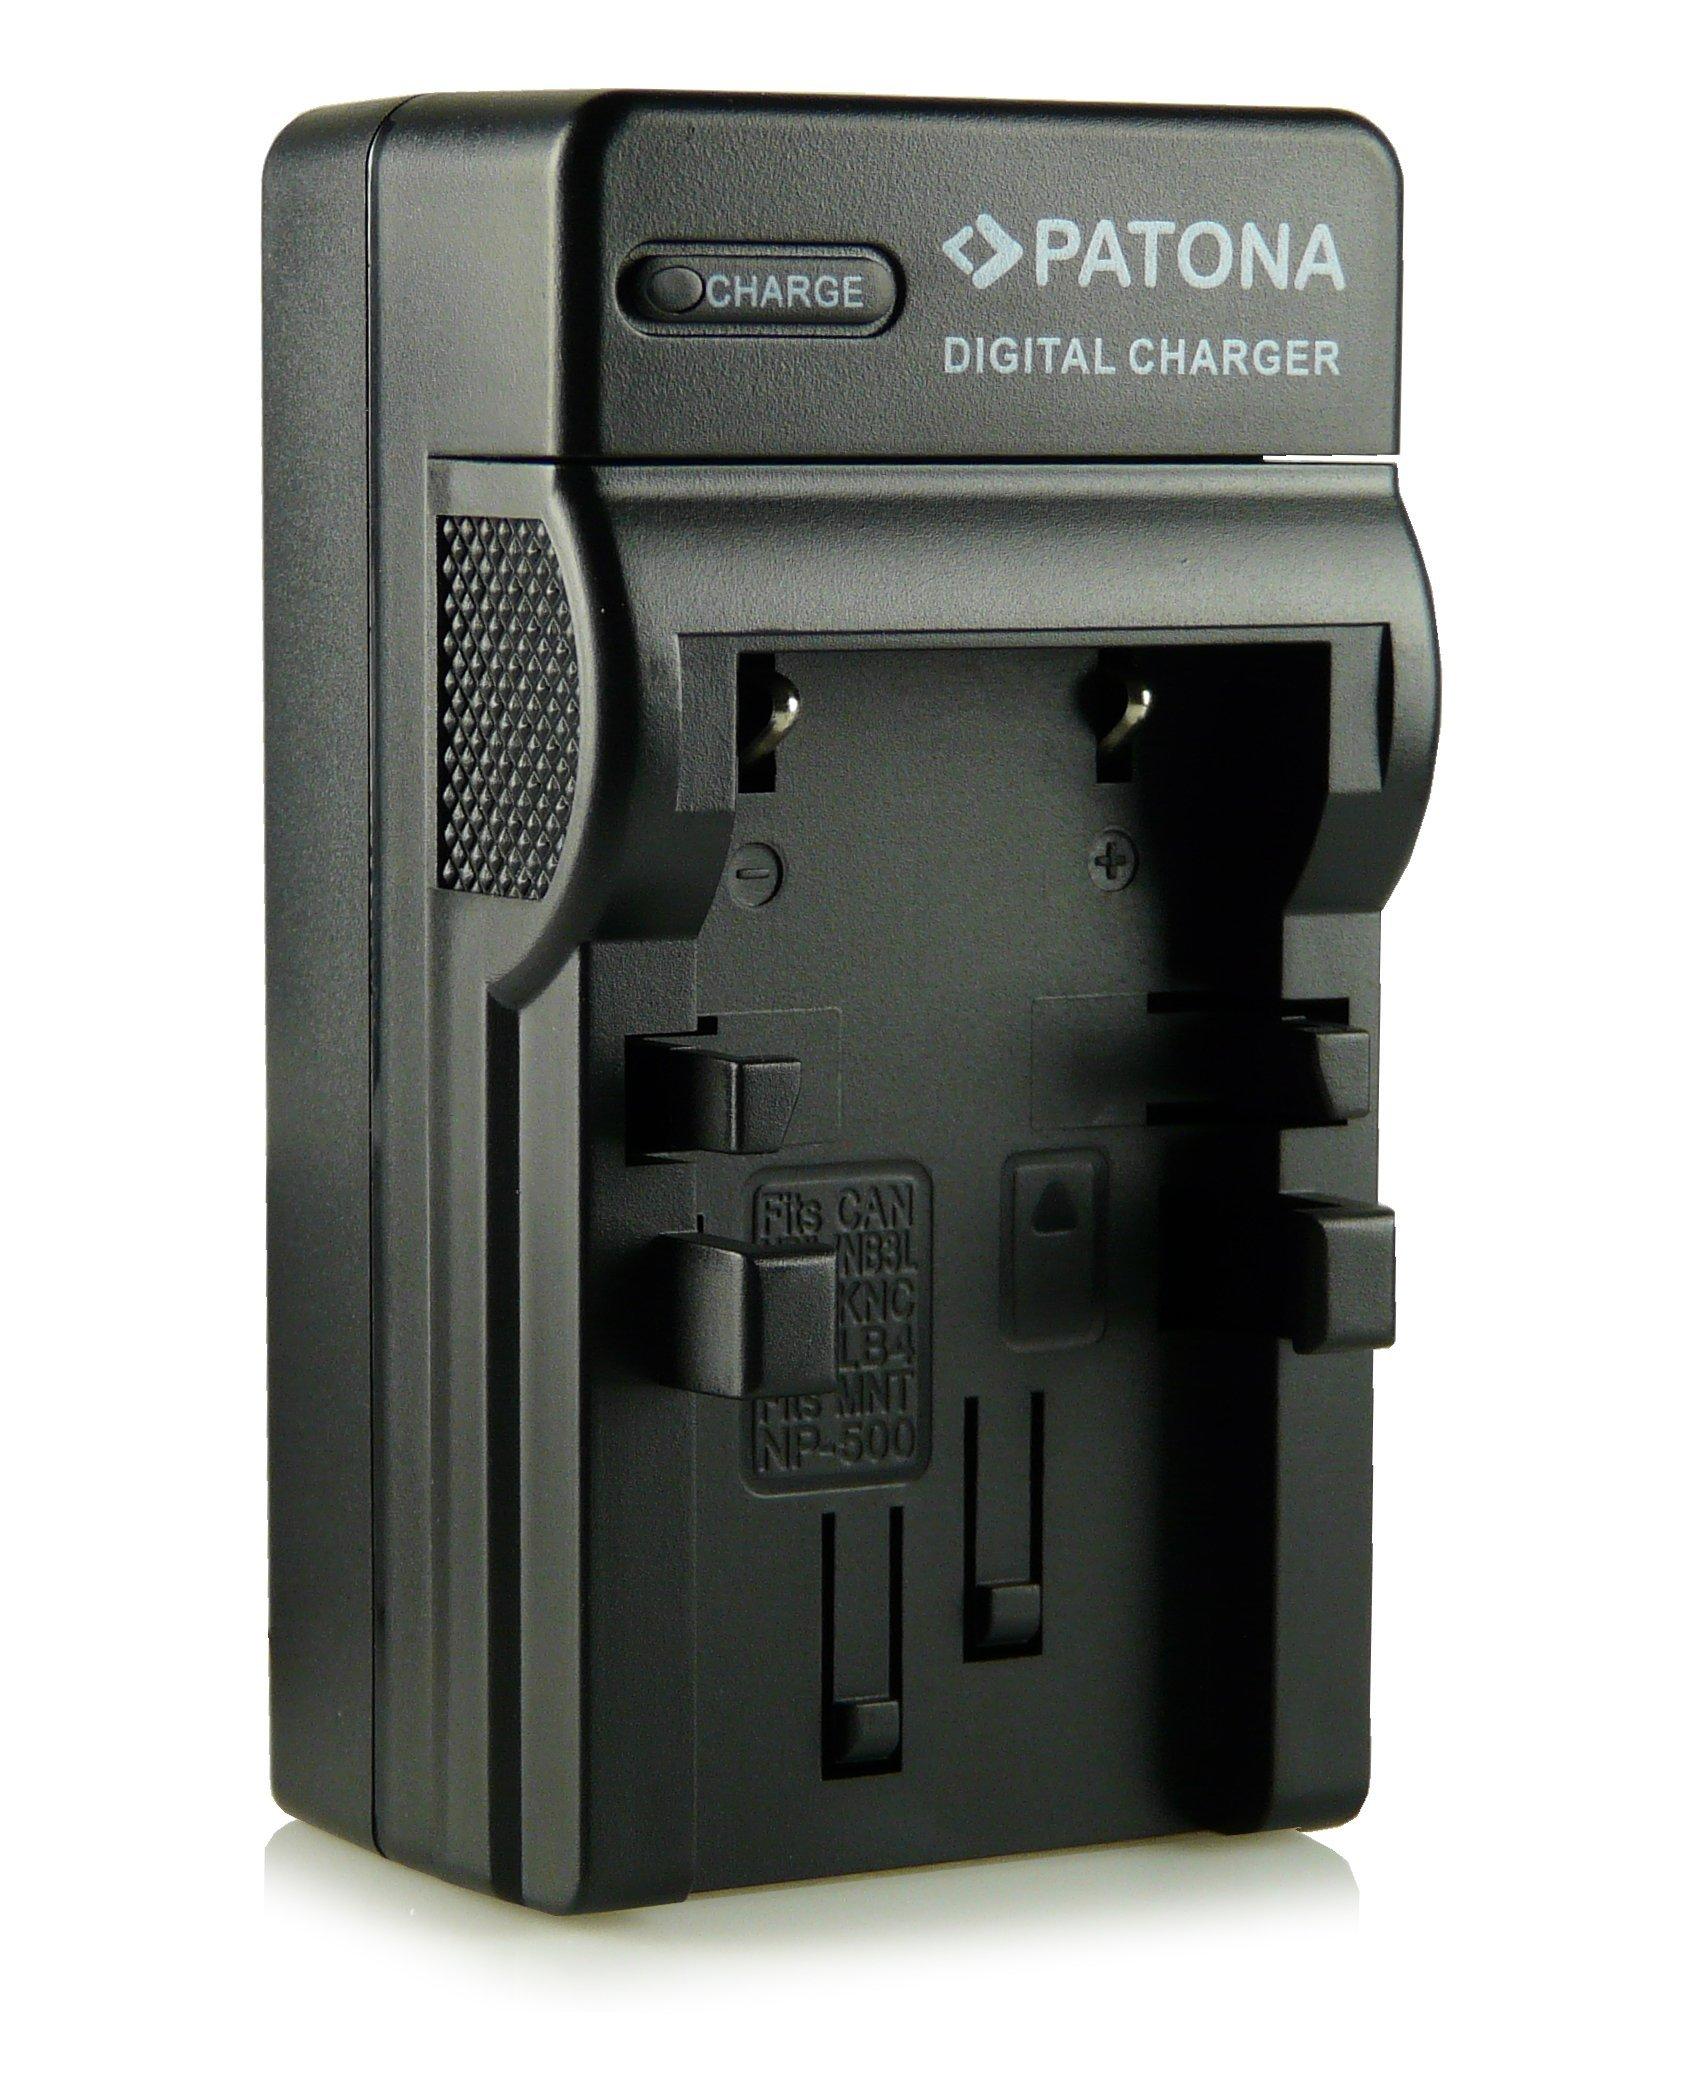 3in1 Caricatore NB-1LH per Canon Digital IXUS 330 | 400 | 430 | 500 | V | V2 | V3 | PowerShot Digita